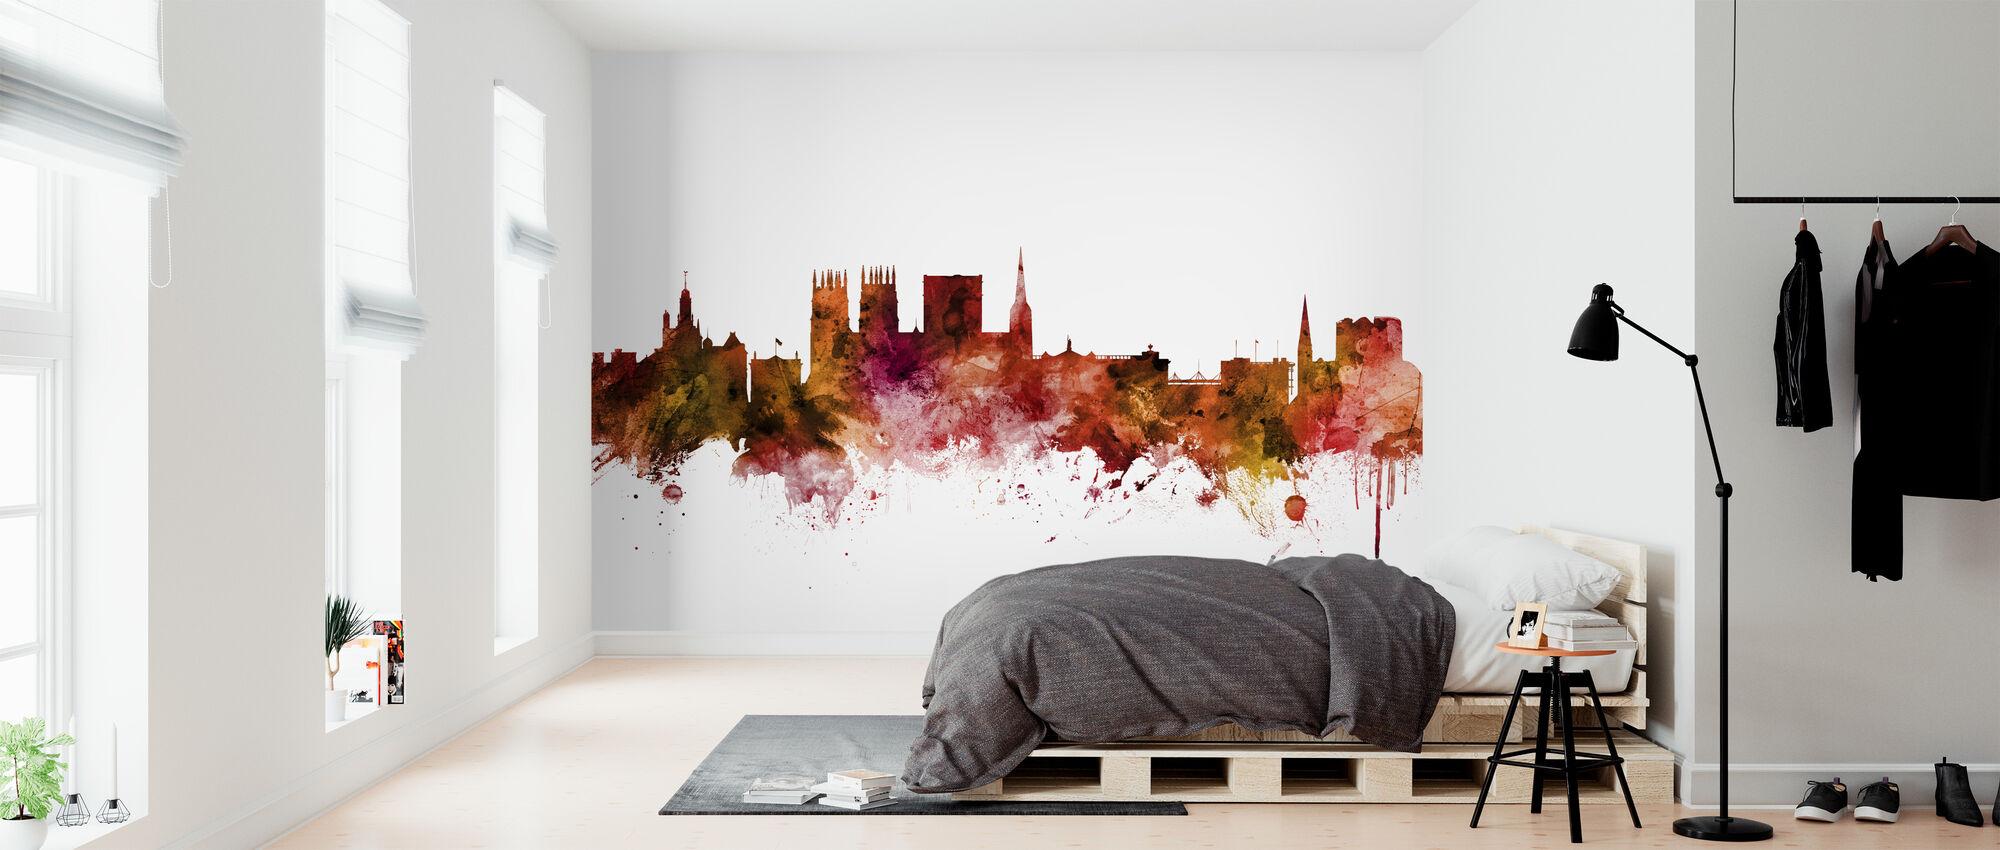 York England Skyline - Wallpaper - Bedroom